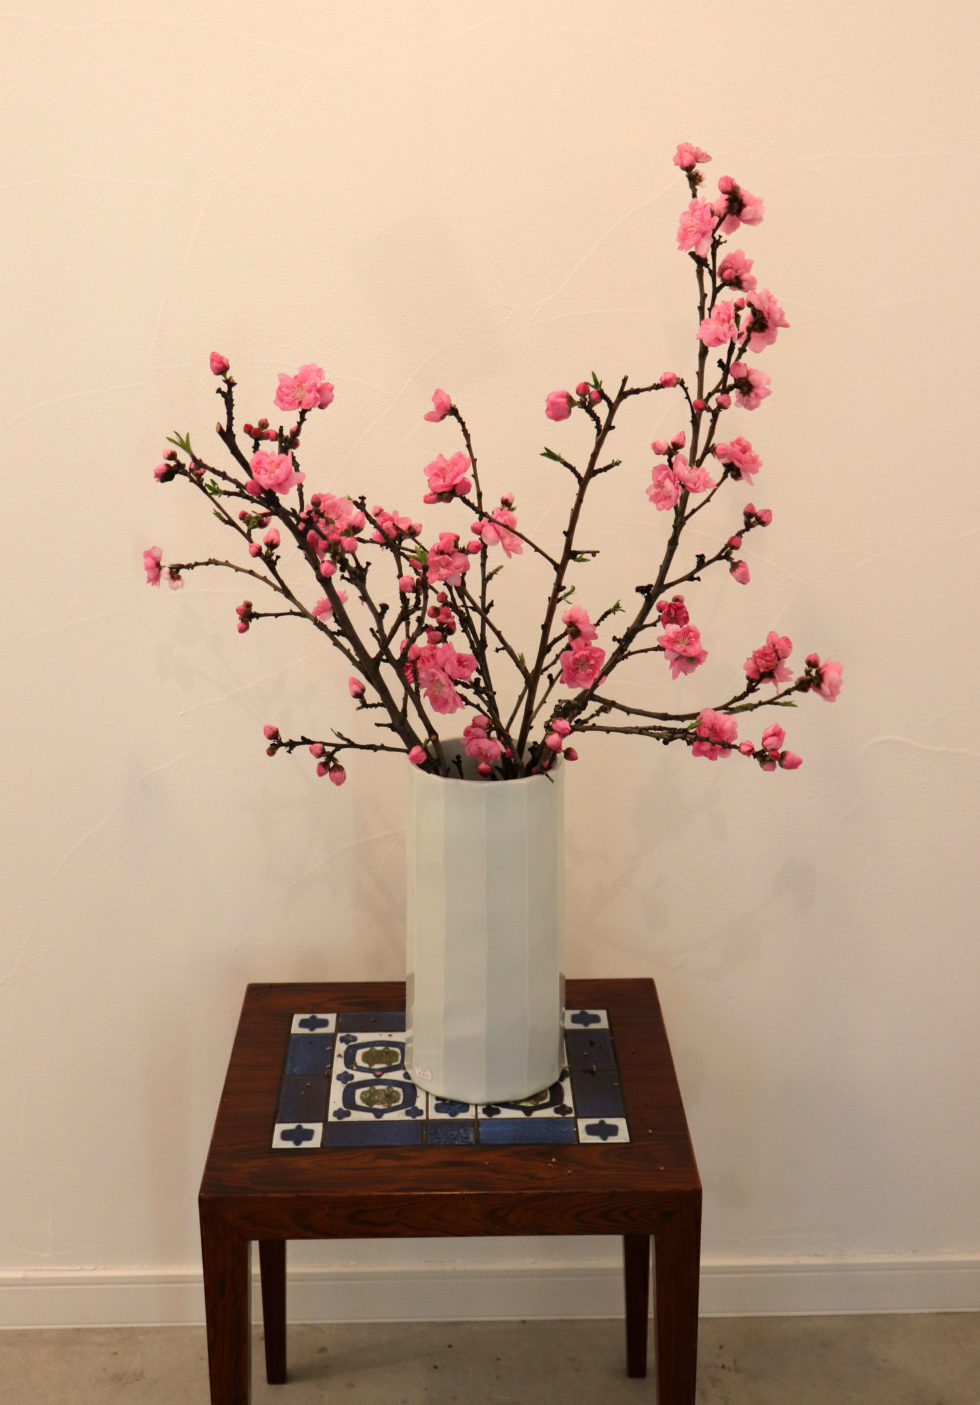 royal copenhagen tenera 五十嵐元次 花桃 pot and tea miho umezawa